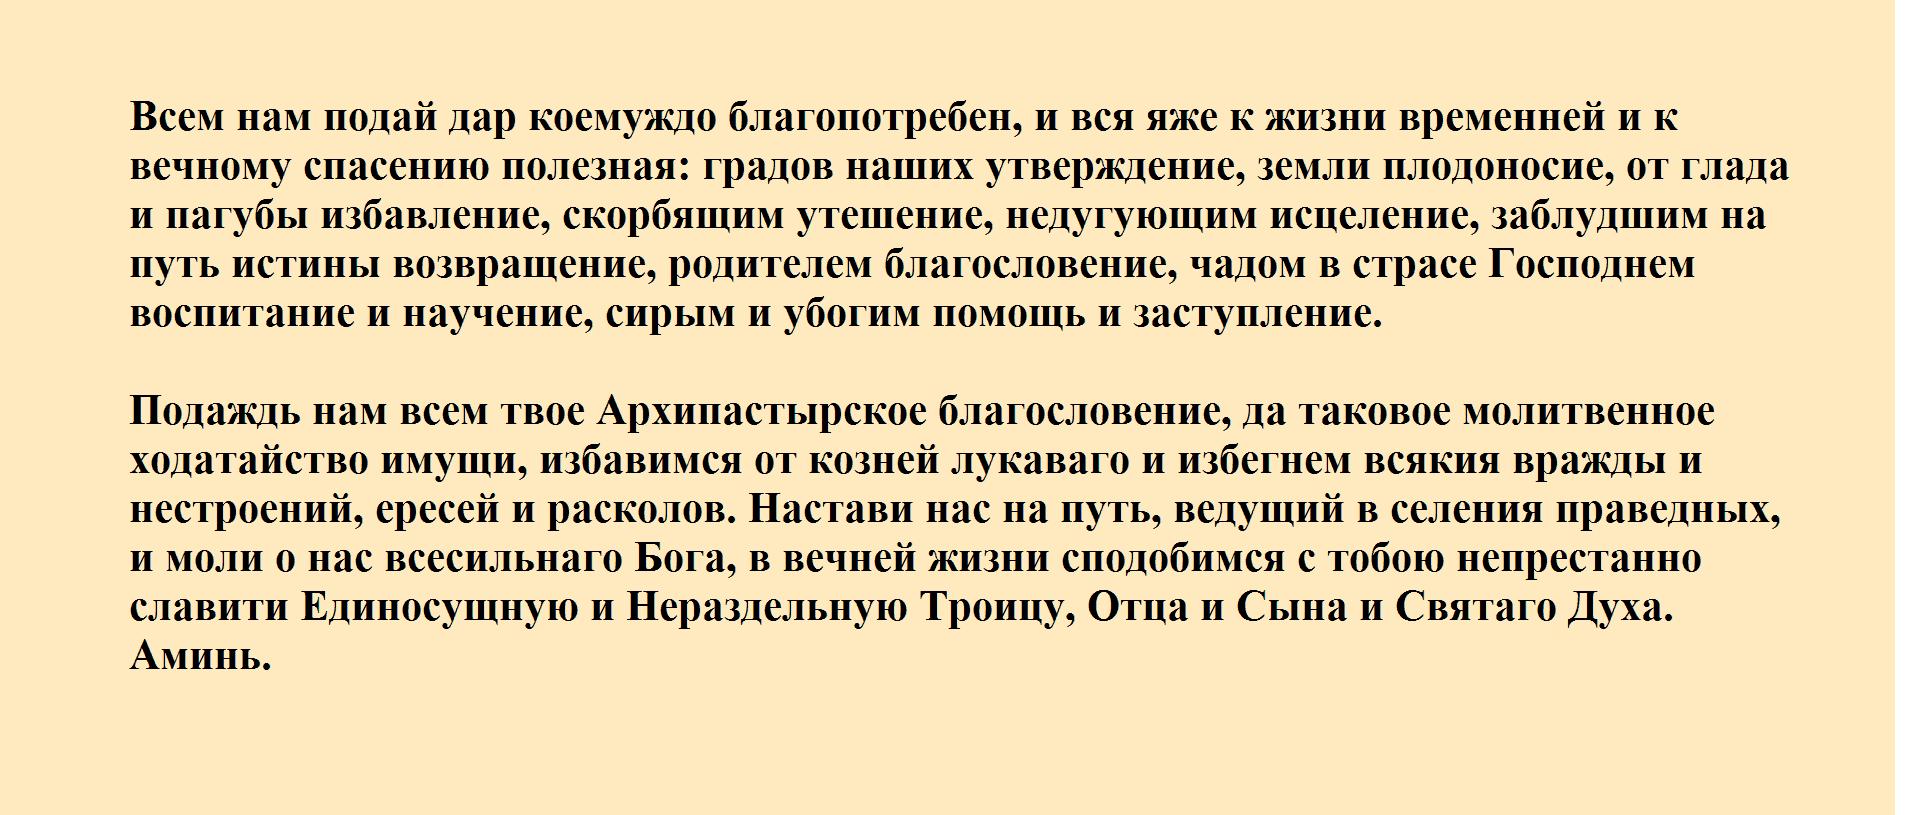 Молитва Луке Крымскому о здравии, на исцеление от болезни